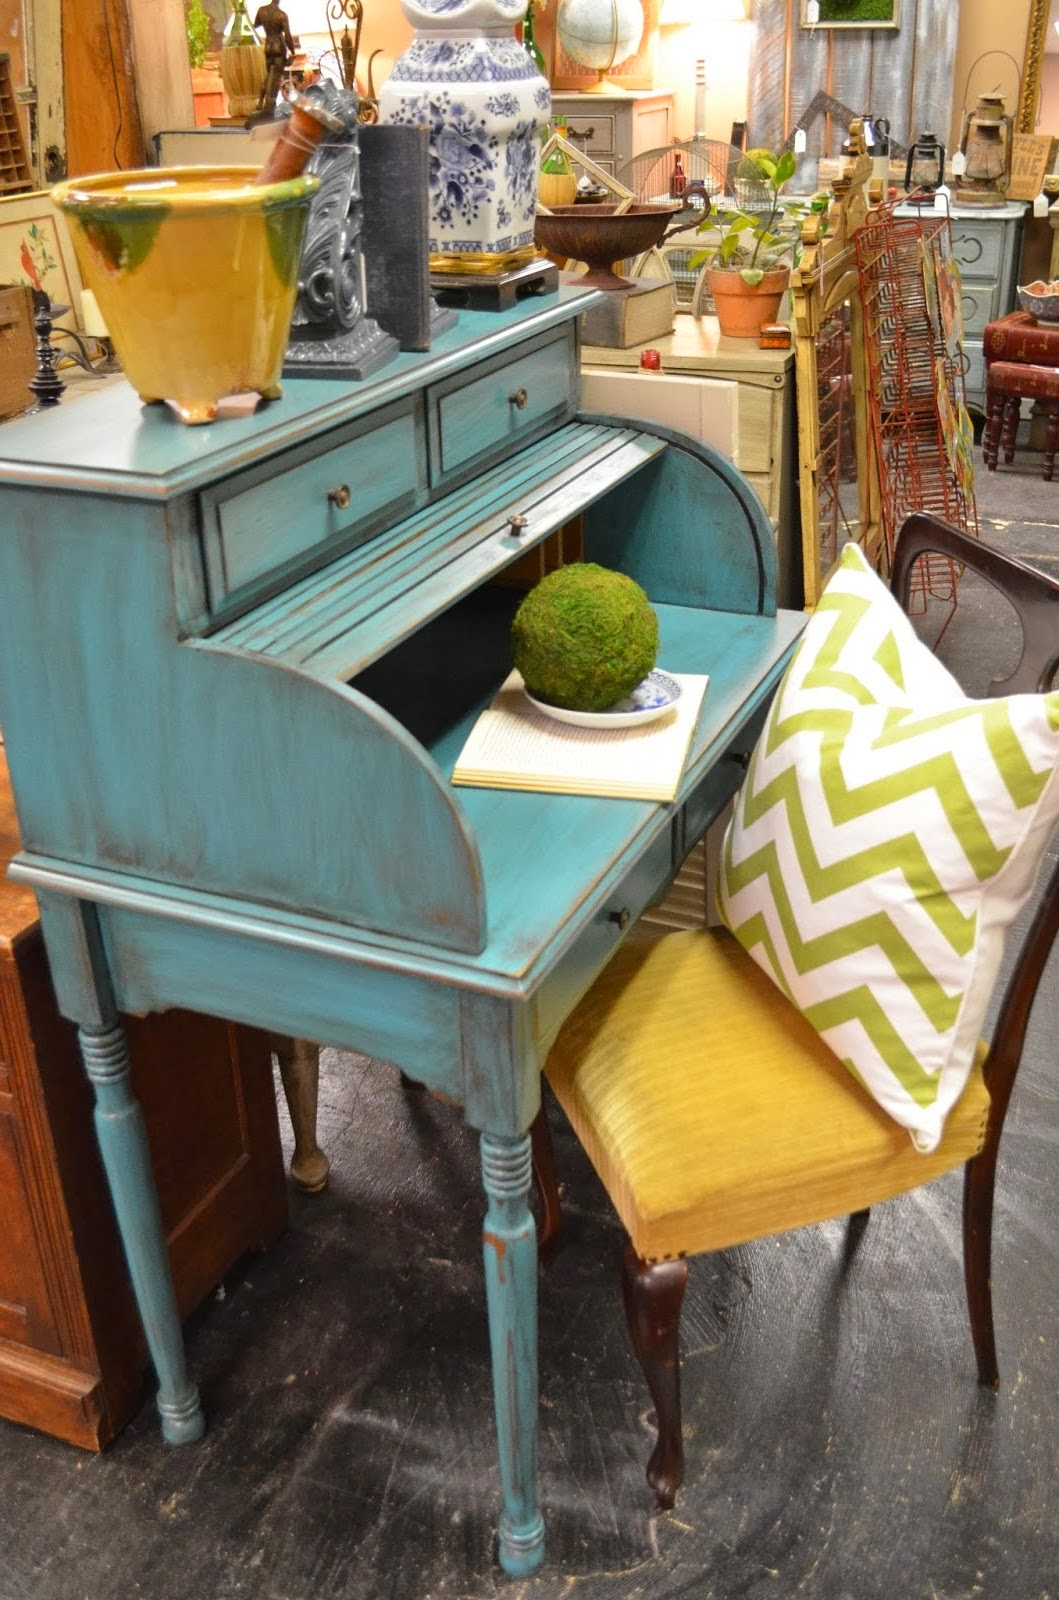 Dipingere vecchio armadio - Dipingere mobili vecchi ...